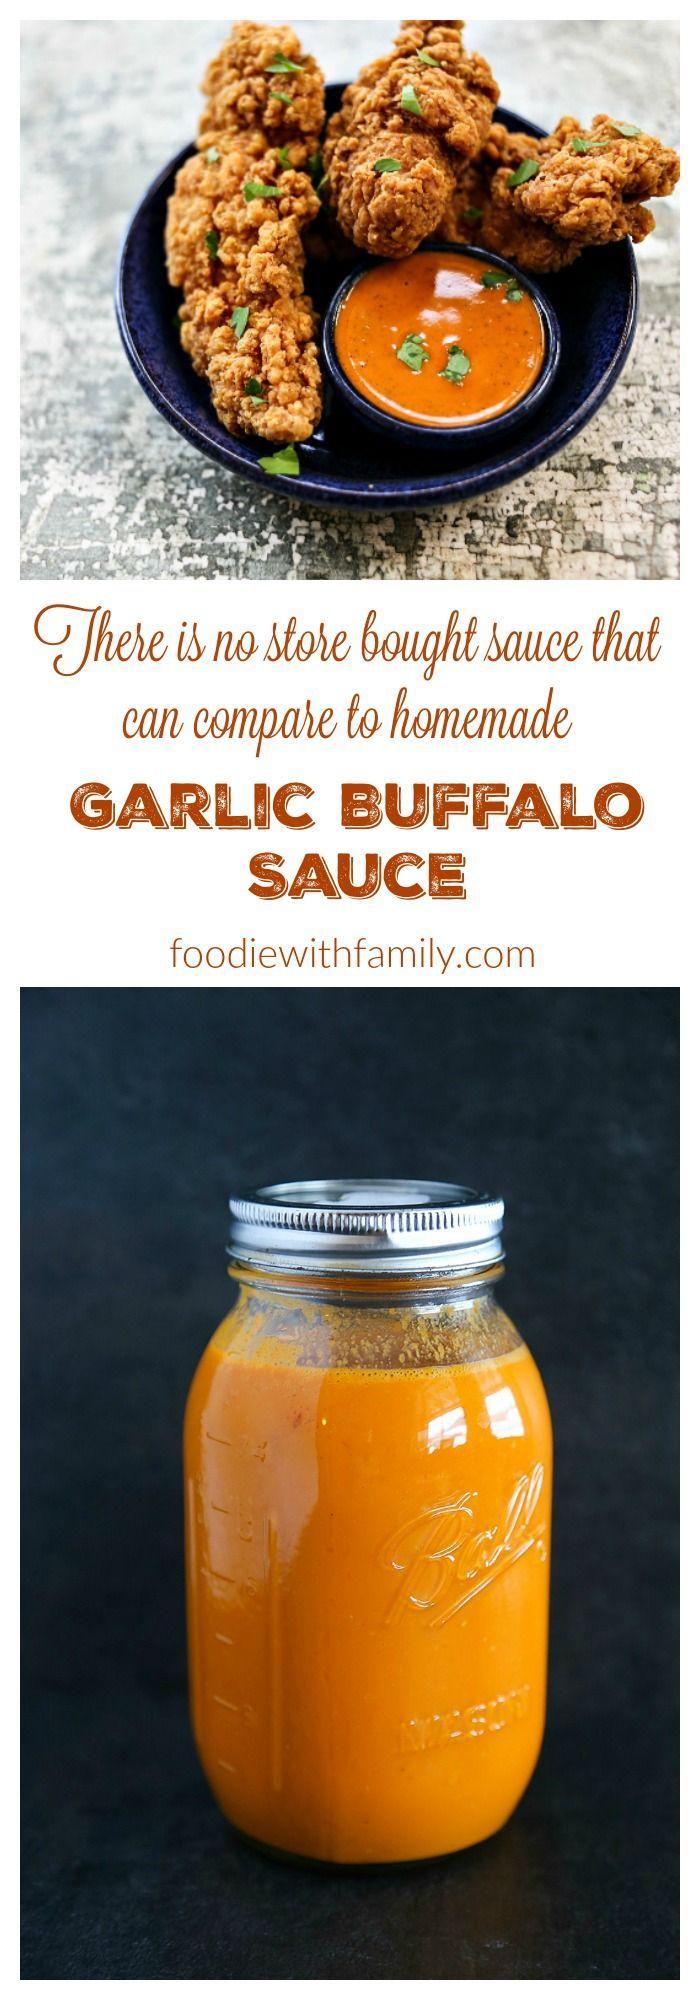 Garlic Buffalo Sauce Recipe because homemade is infinitely better than store bought! (Homemade Butter Chicken)